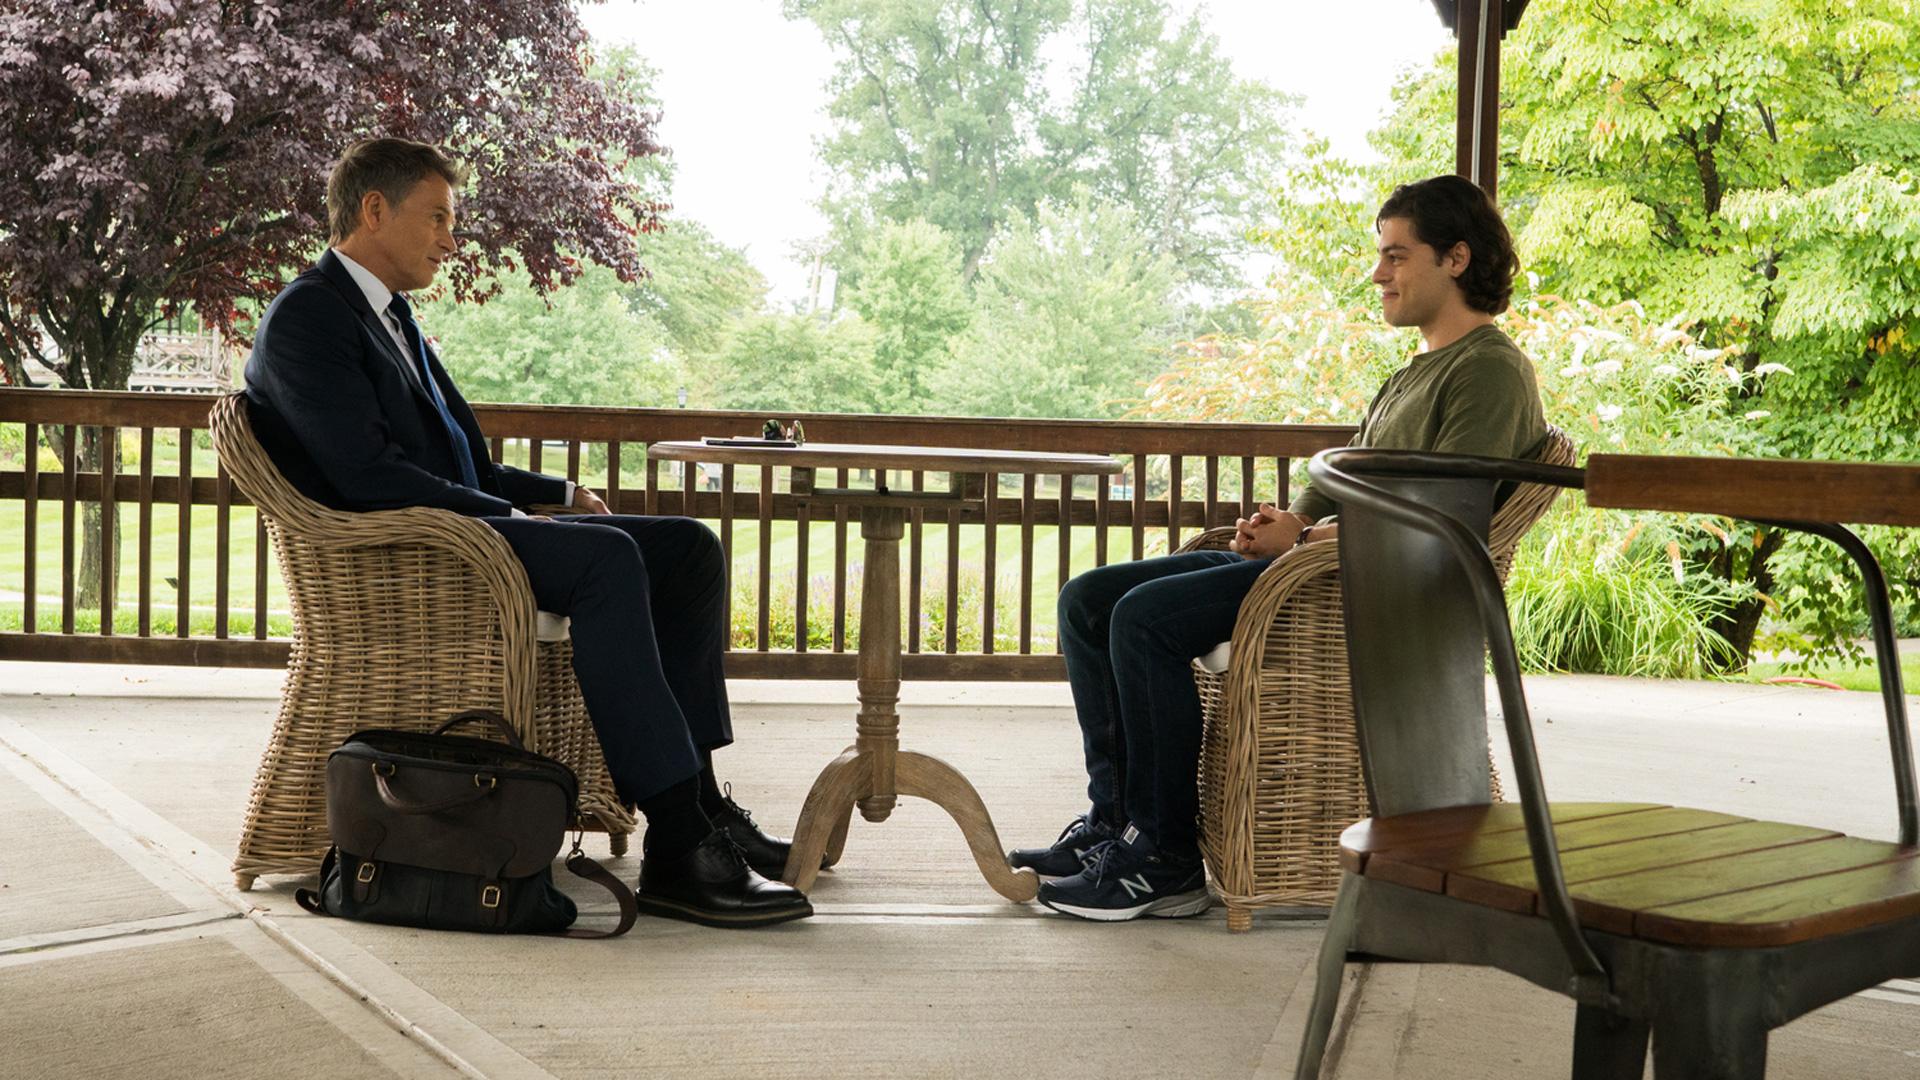 Tim and Chris face off in this Madam Secretary scene.